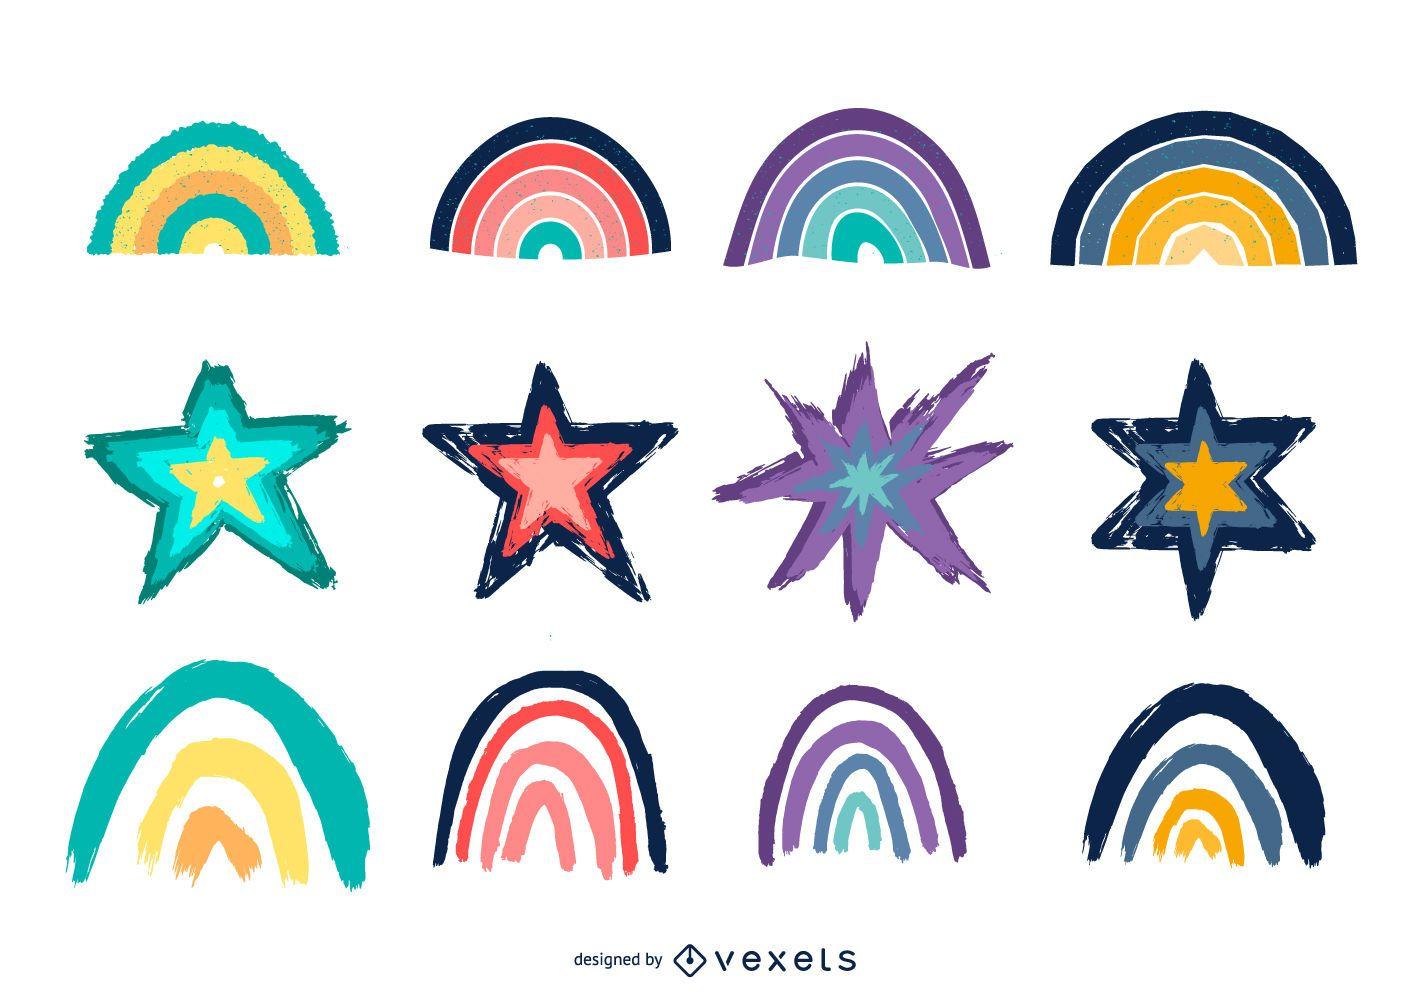 Illustrated Rainbow and Stars Design Pack